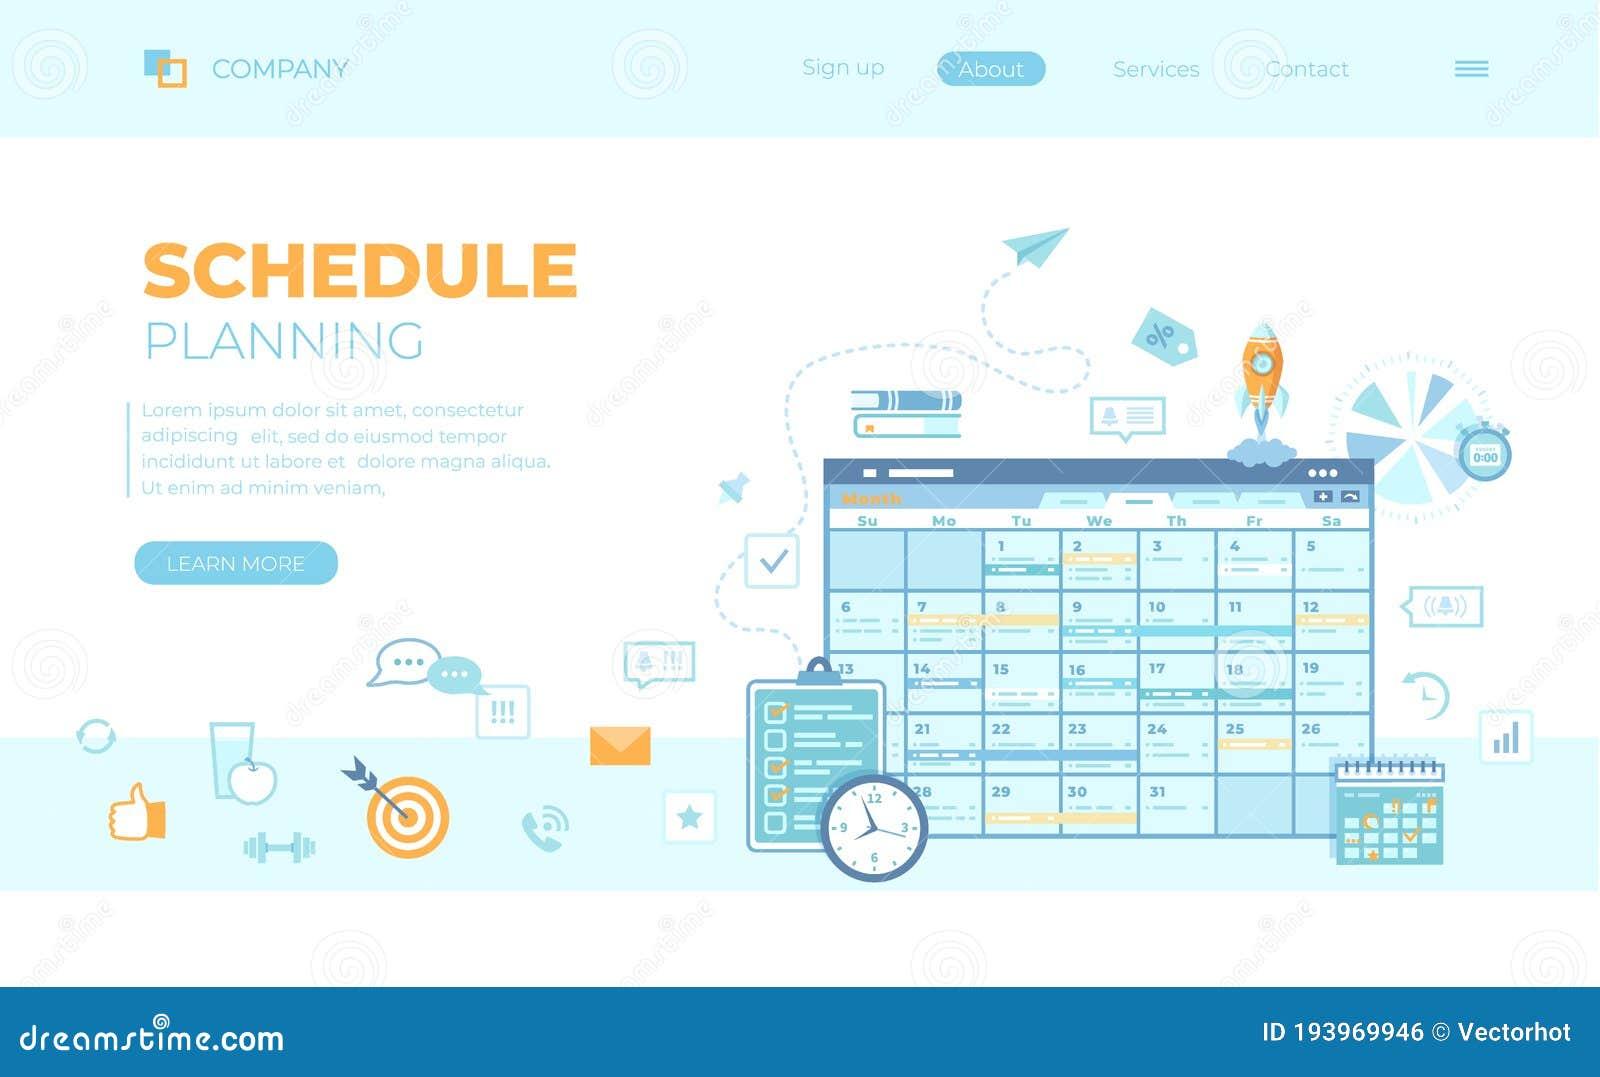 planning schedule online app web page interface planner organizer calendar project plan tasks reminders 193969946